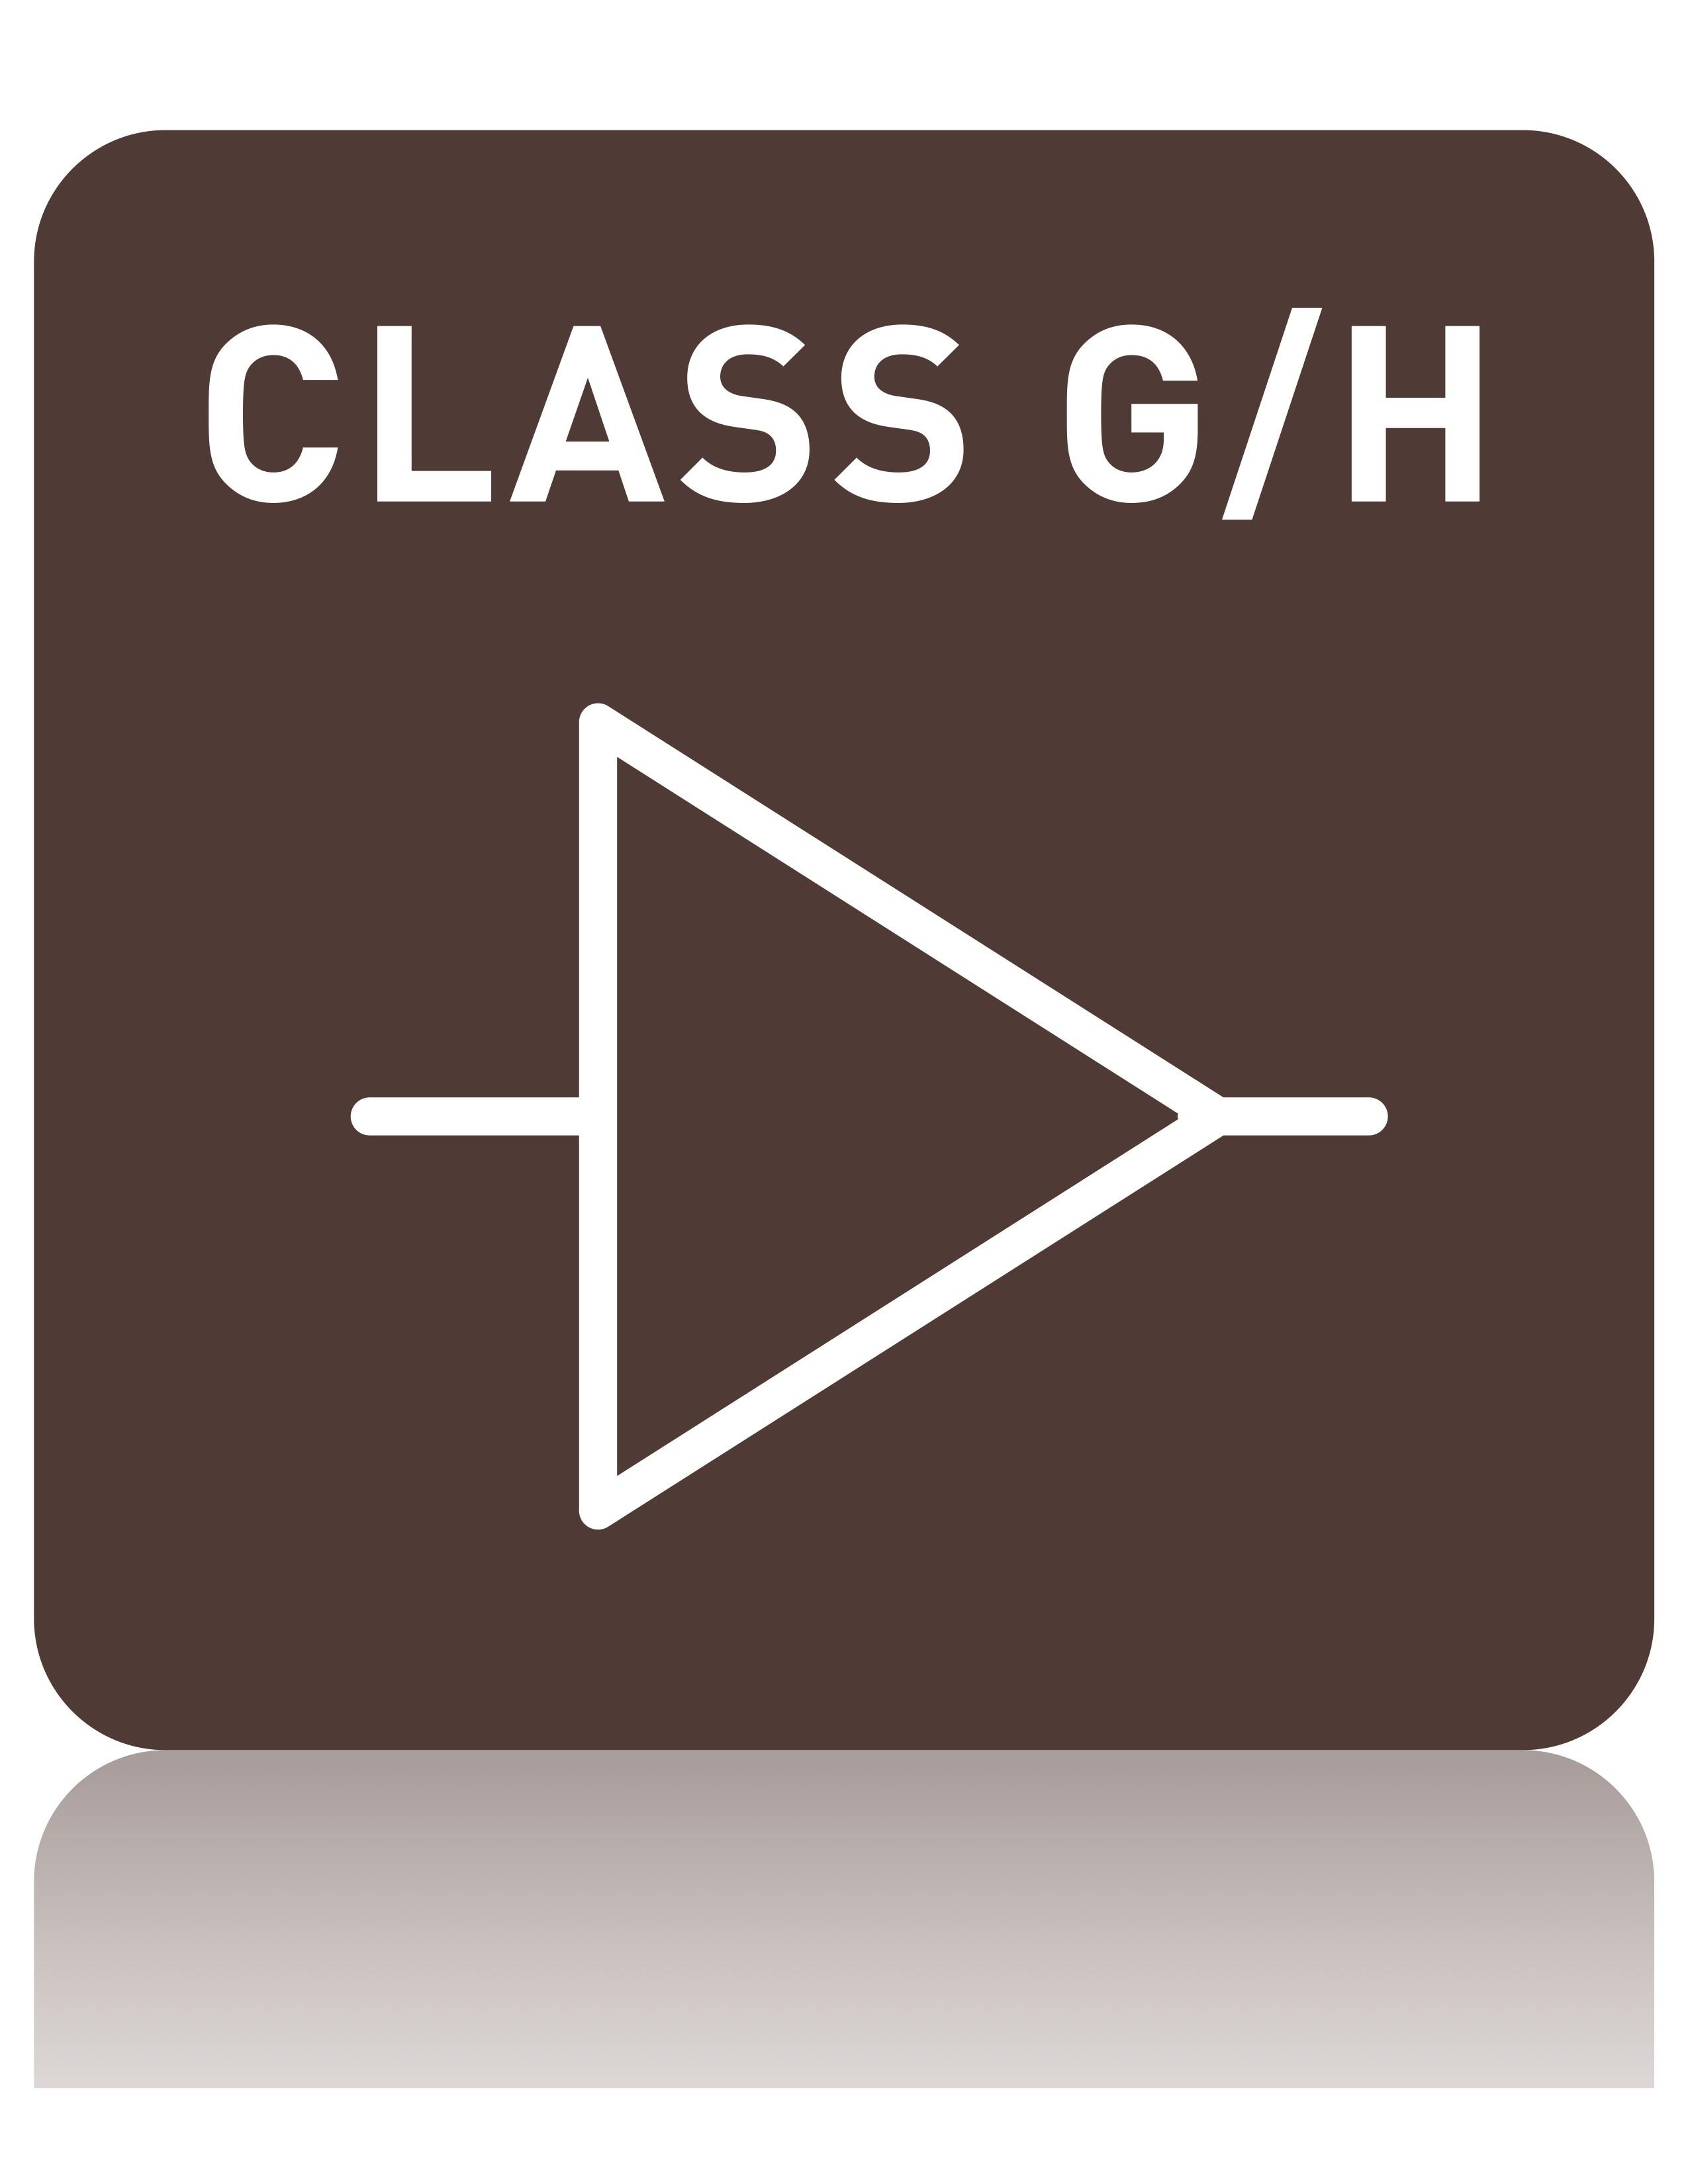 psiaudio_class_GH.jpg